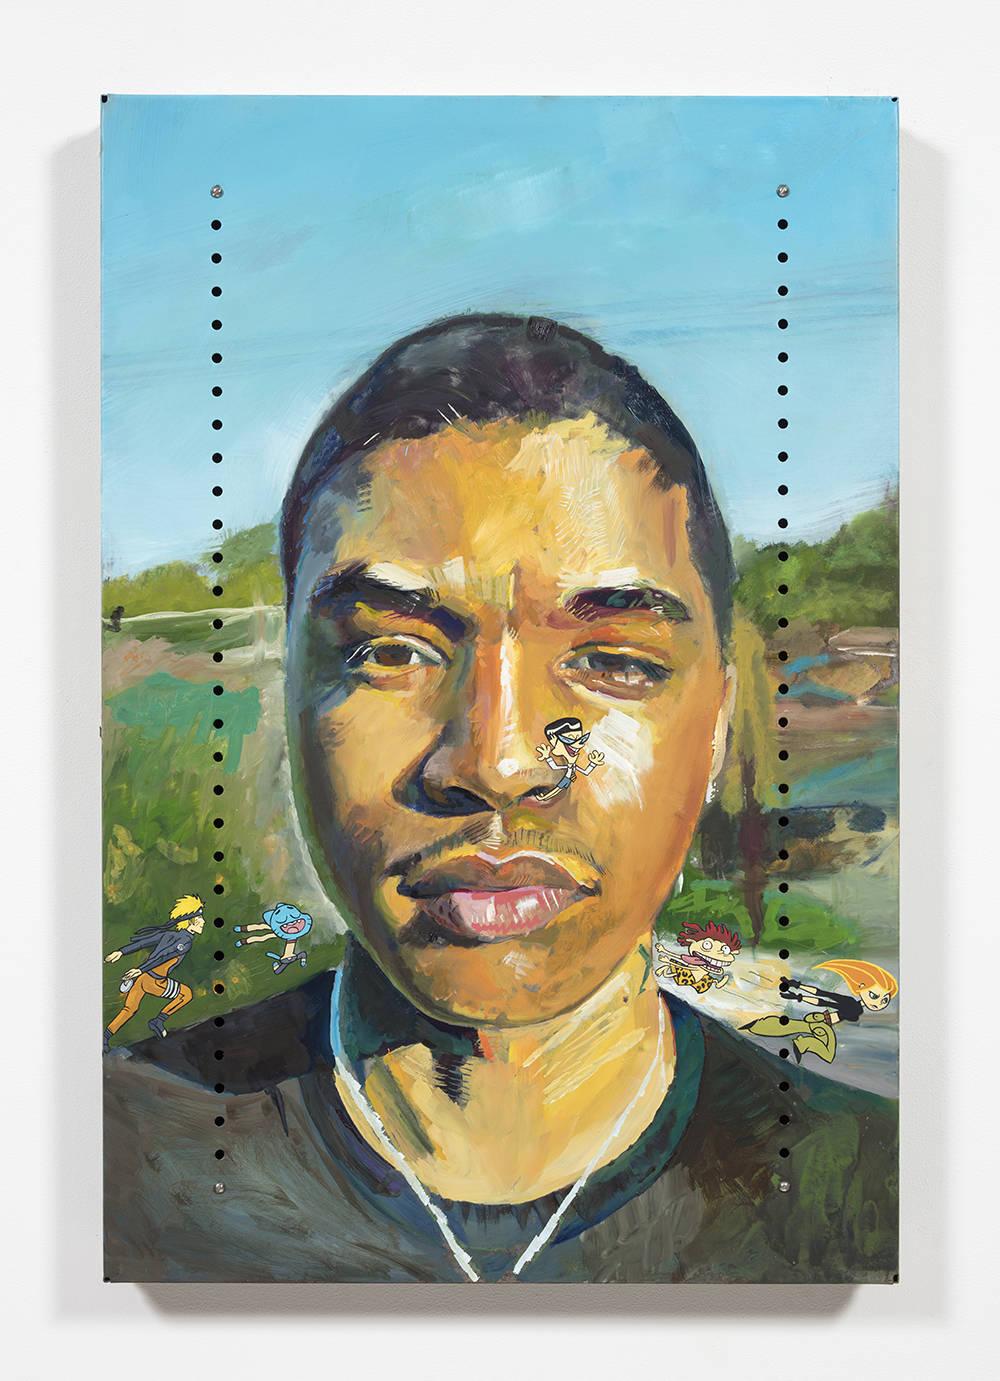 Untitled Portrait of Jon (mandark, naruto, gumball, dannie and kim possible)